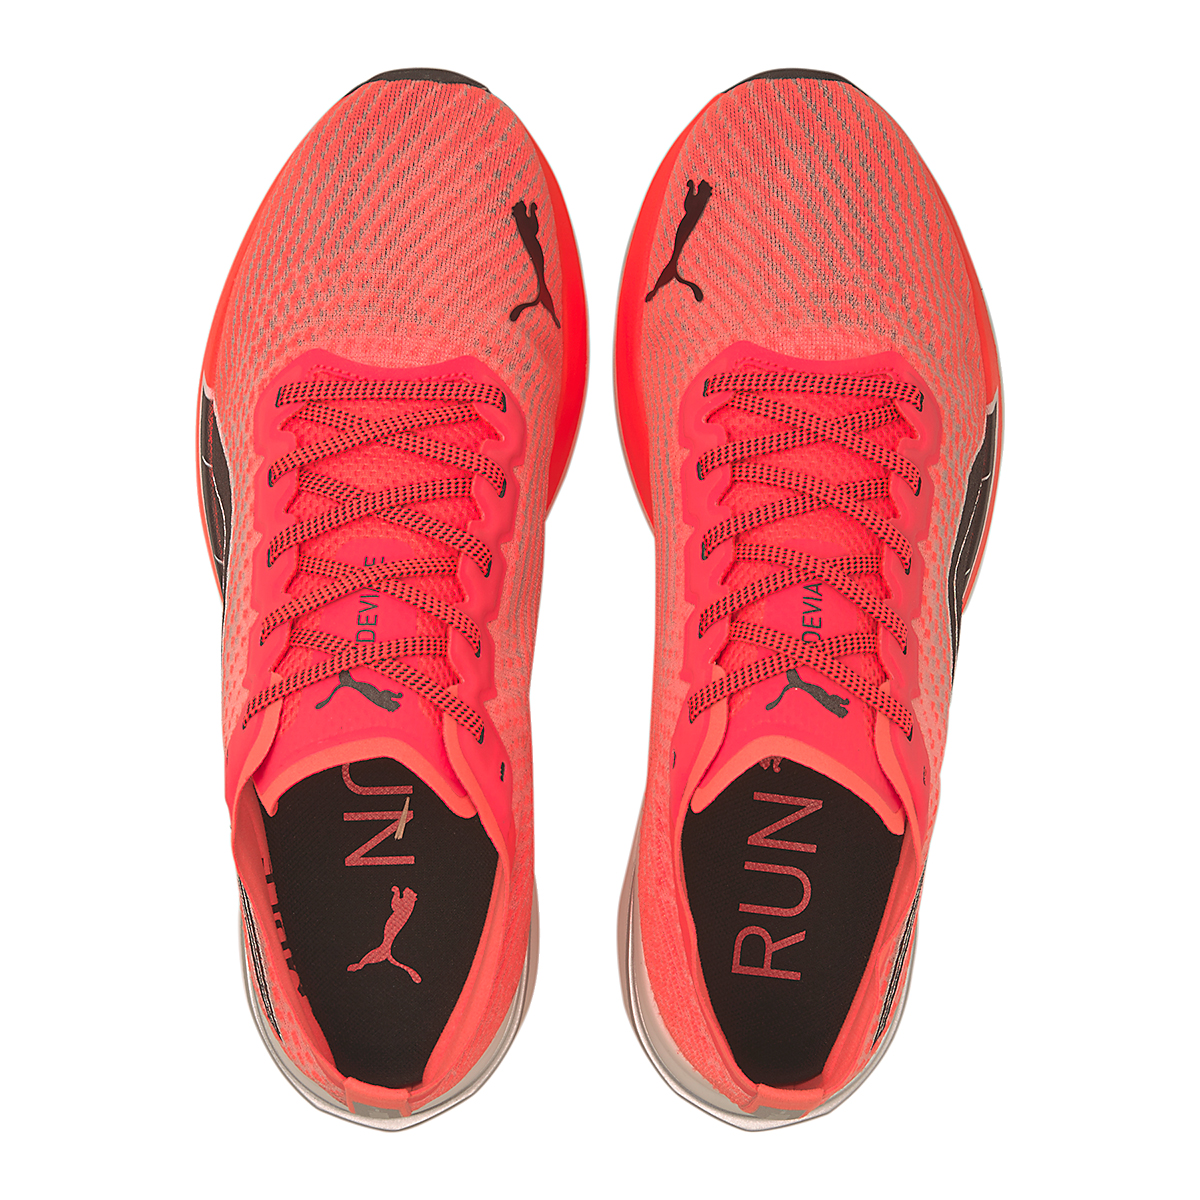 Men's Puma Deviate Nitro Running Shoe - Color: Lava Blast-Puma Black - Size: 7 - Width: Regular, Lava Blast-Puma Black, large, image 4